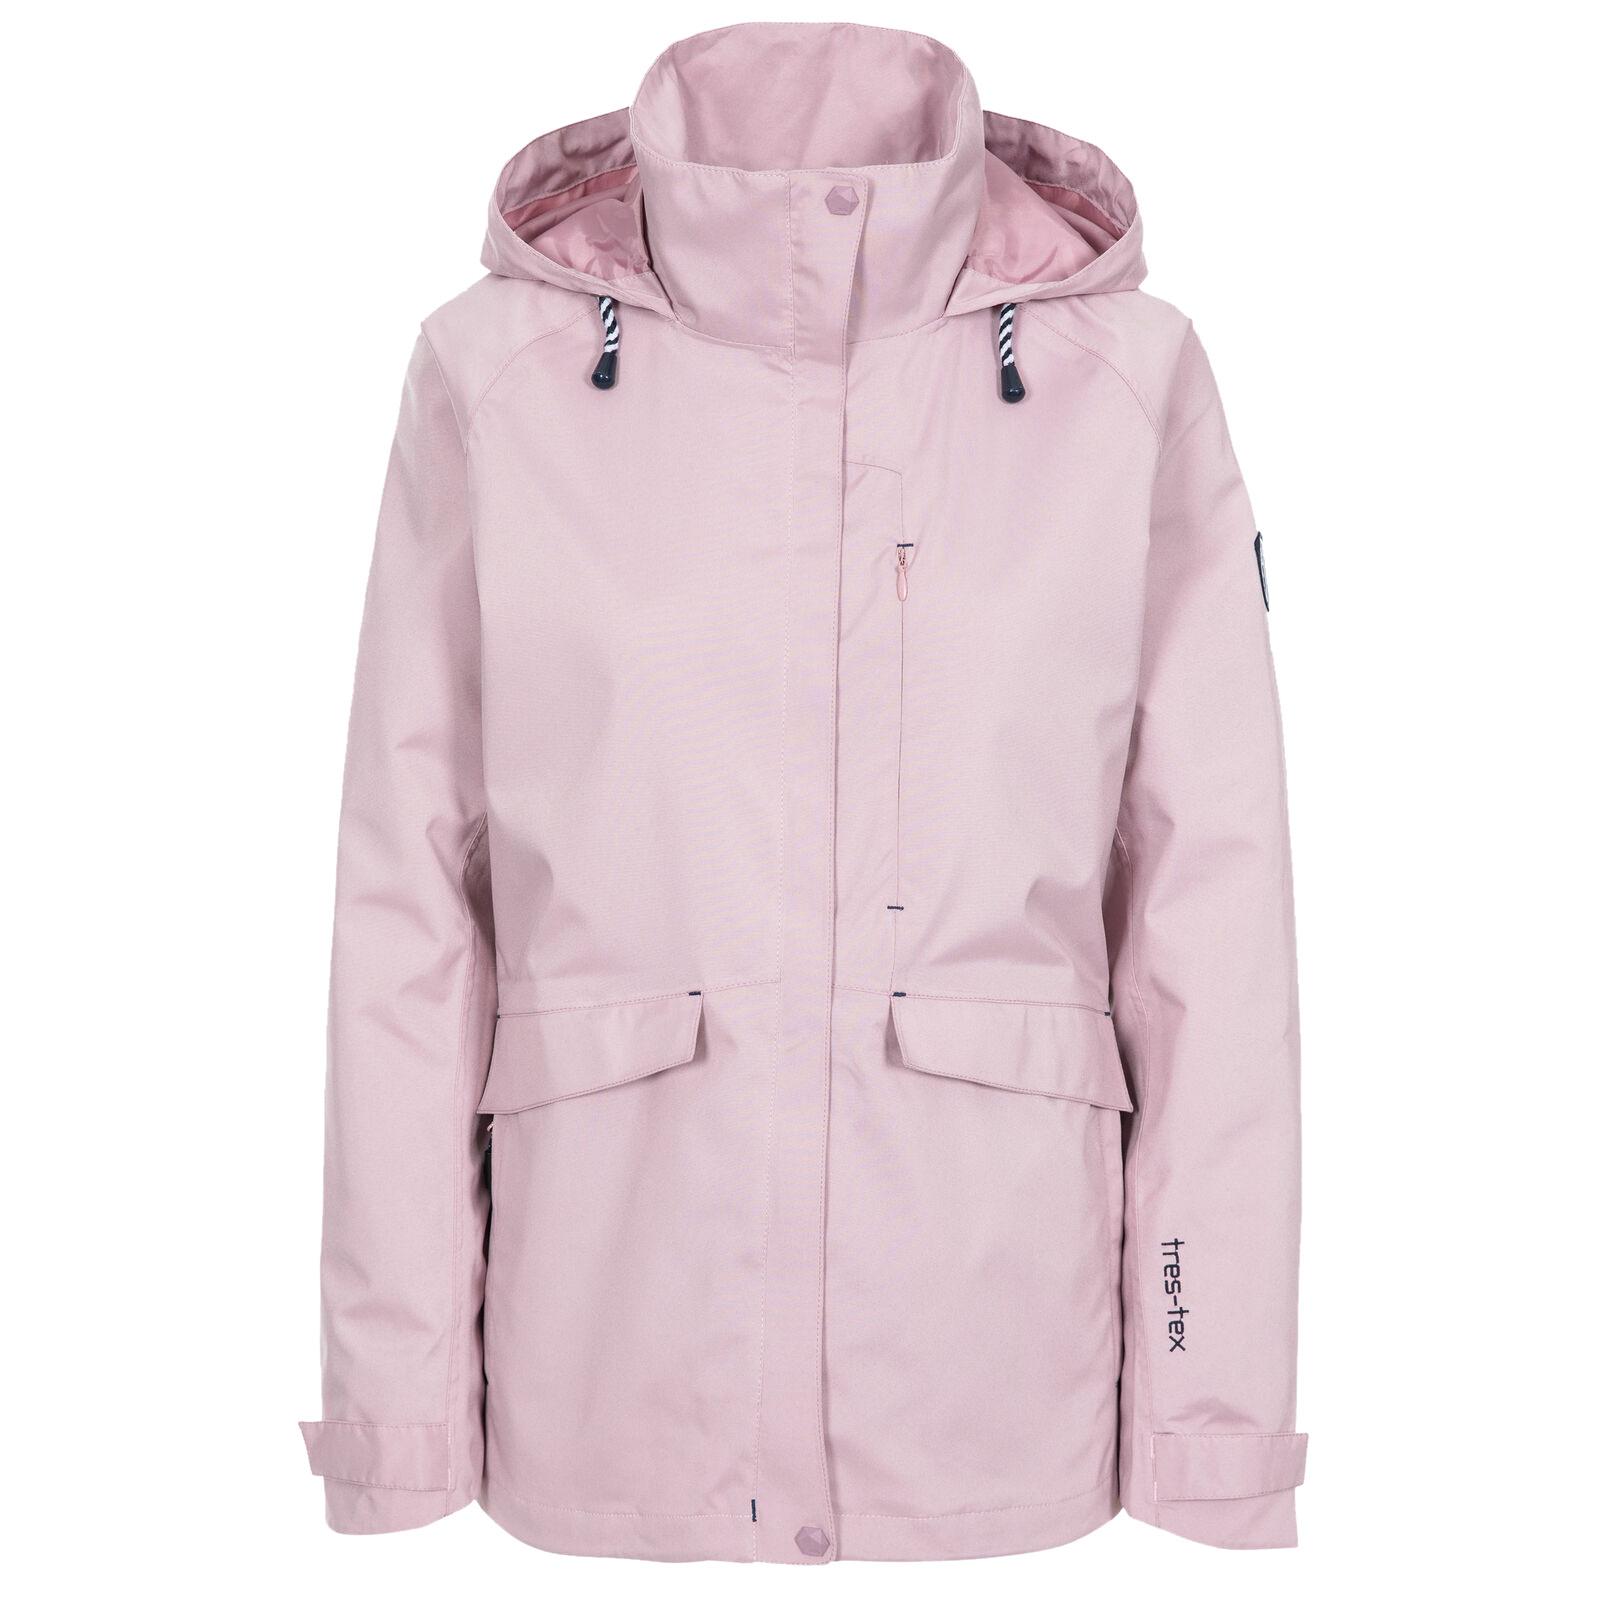 Trespass Womens/Ladies Voyage Waterproof Long-Sleeved Jacket (XS) (Light Lilac)